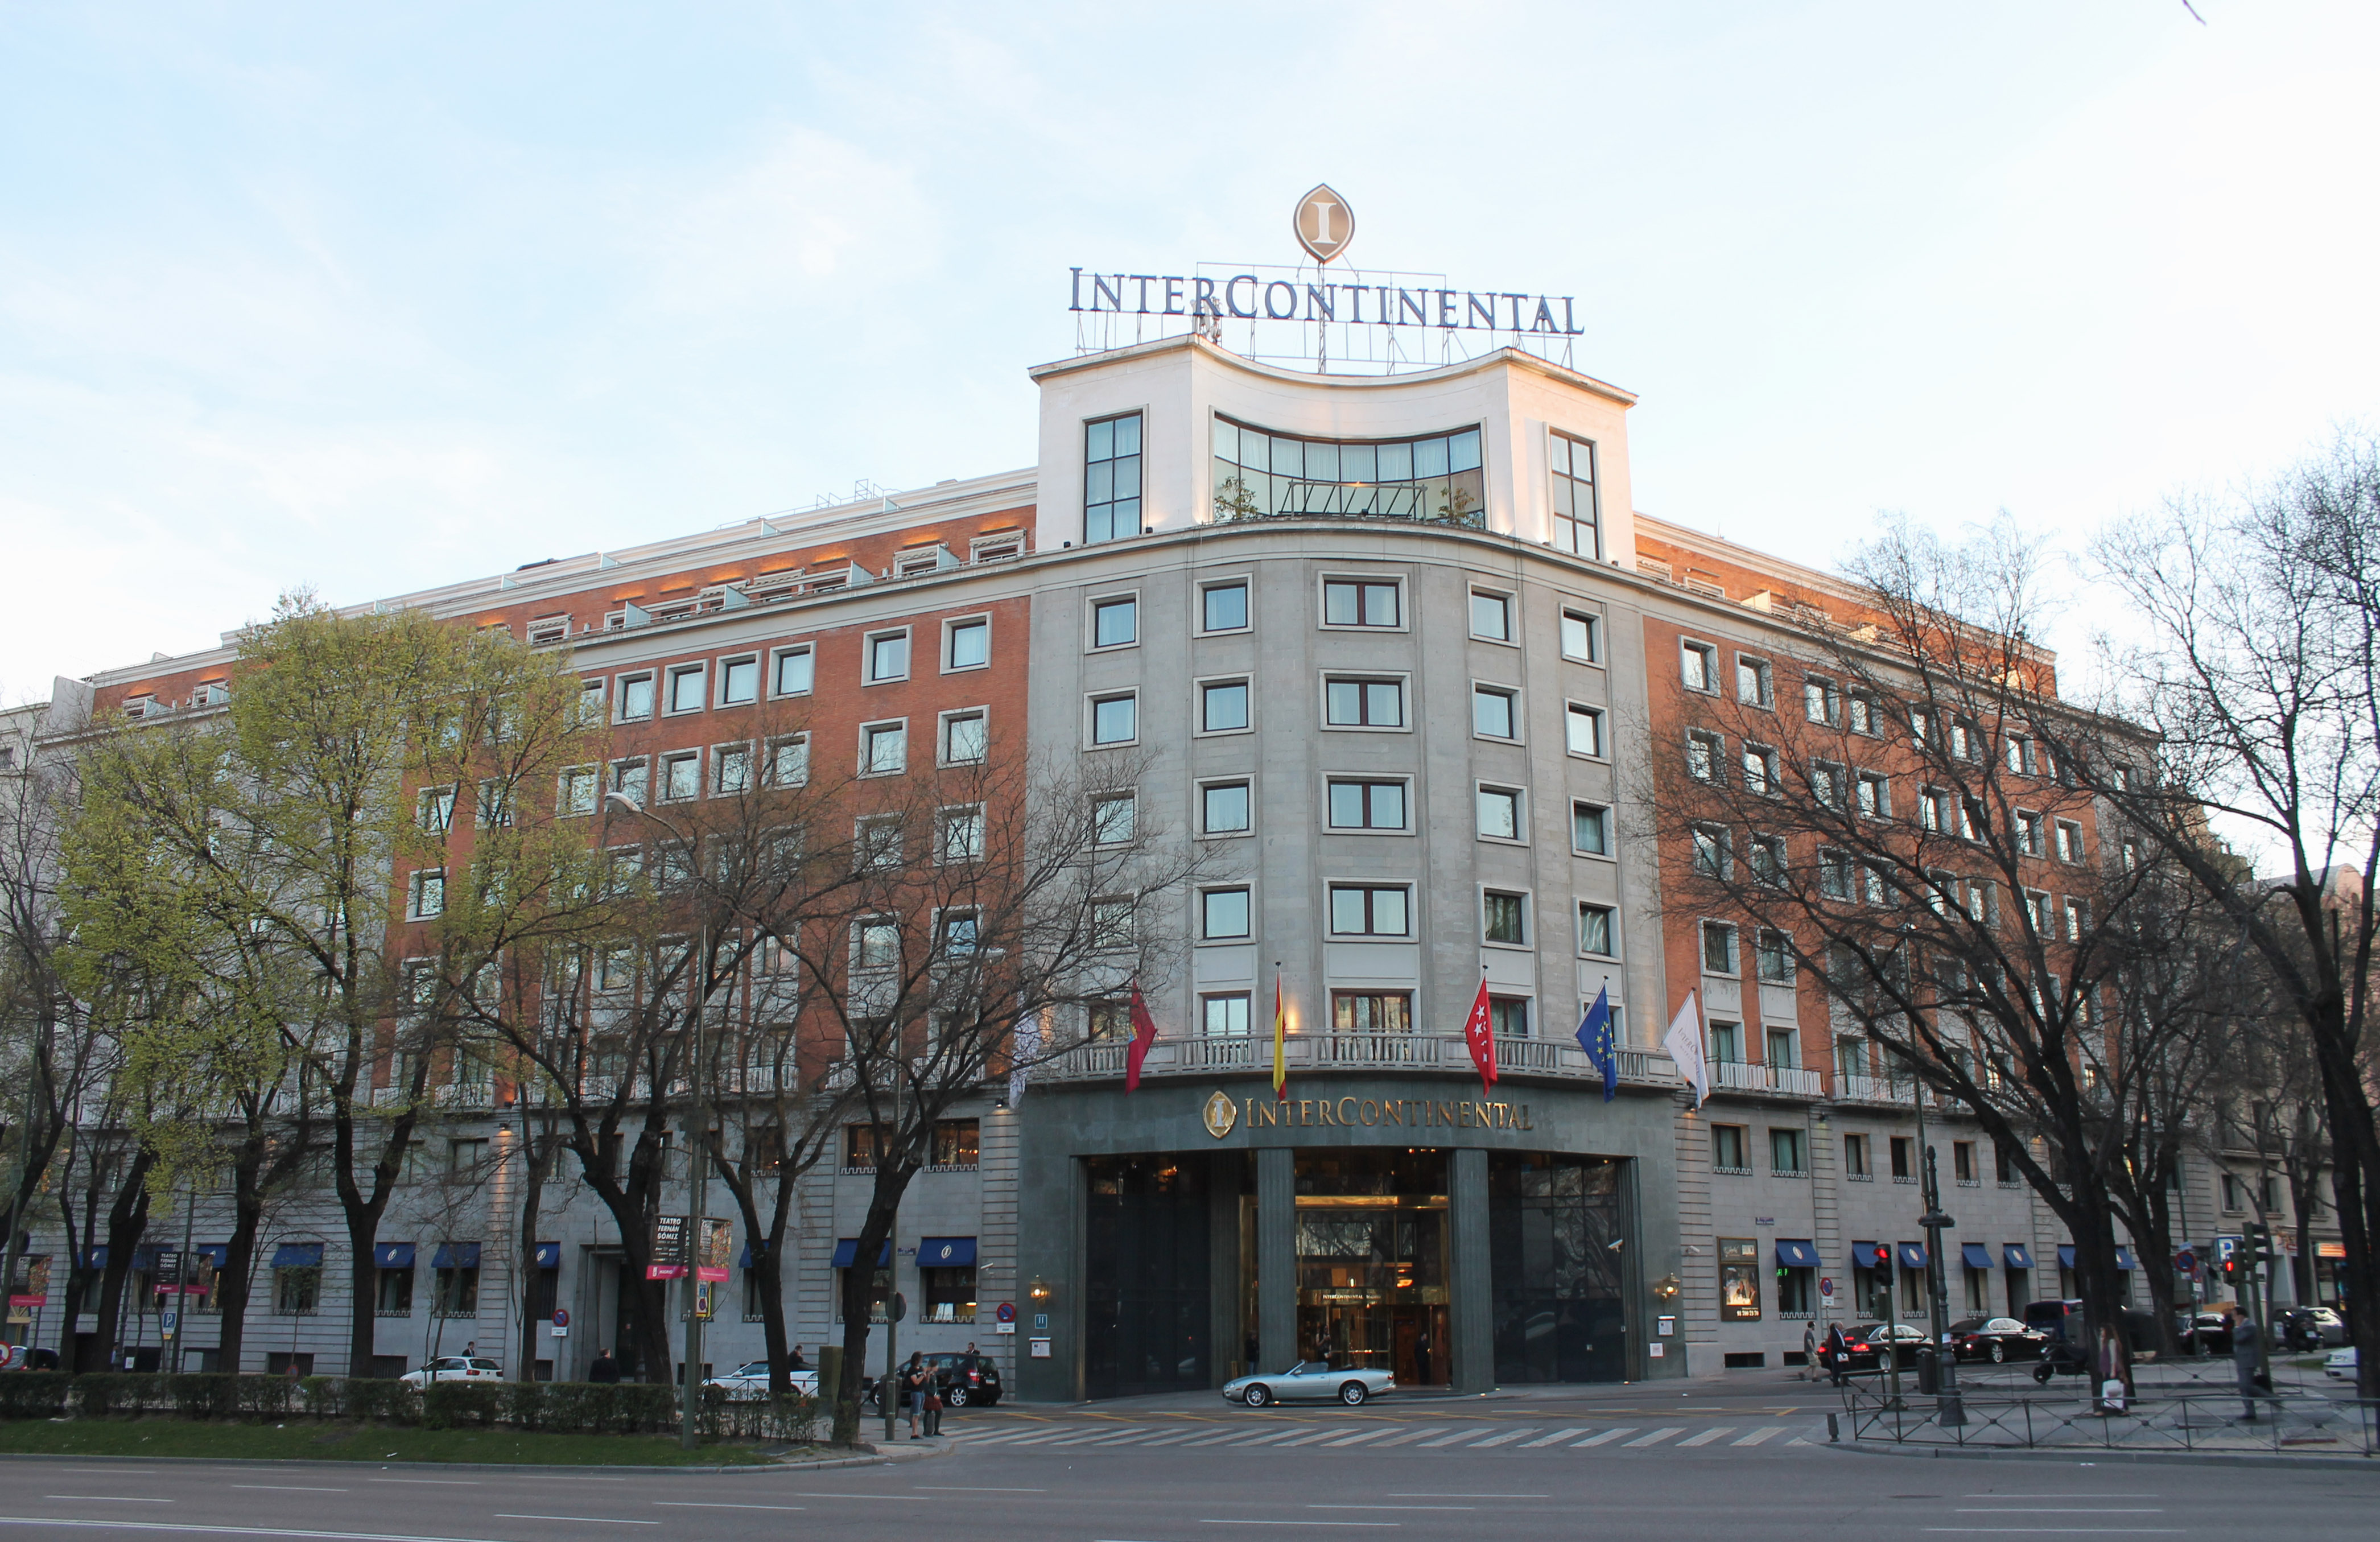 Intercontinental Madrid Ron Phillips Travel